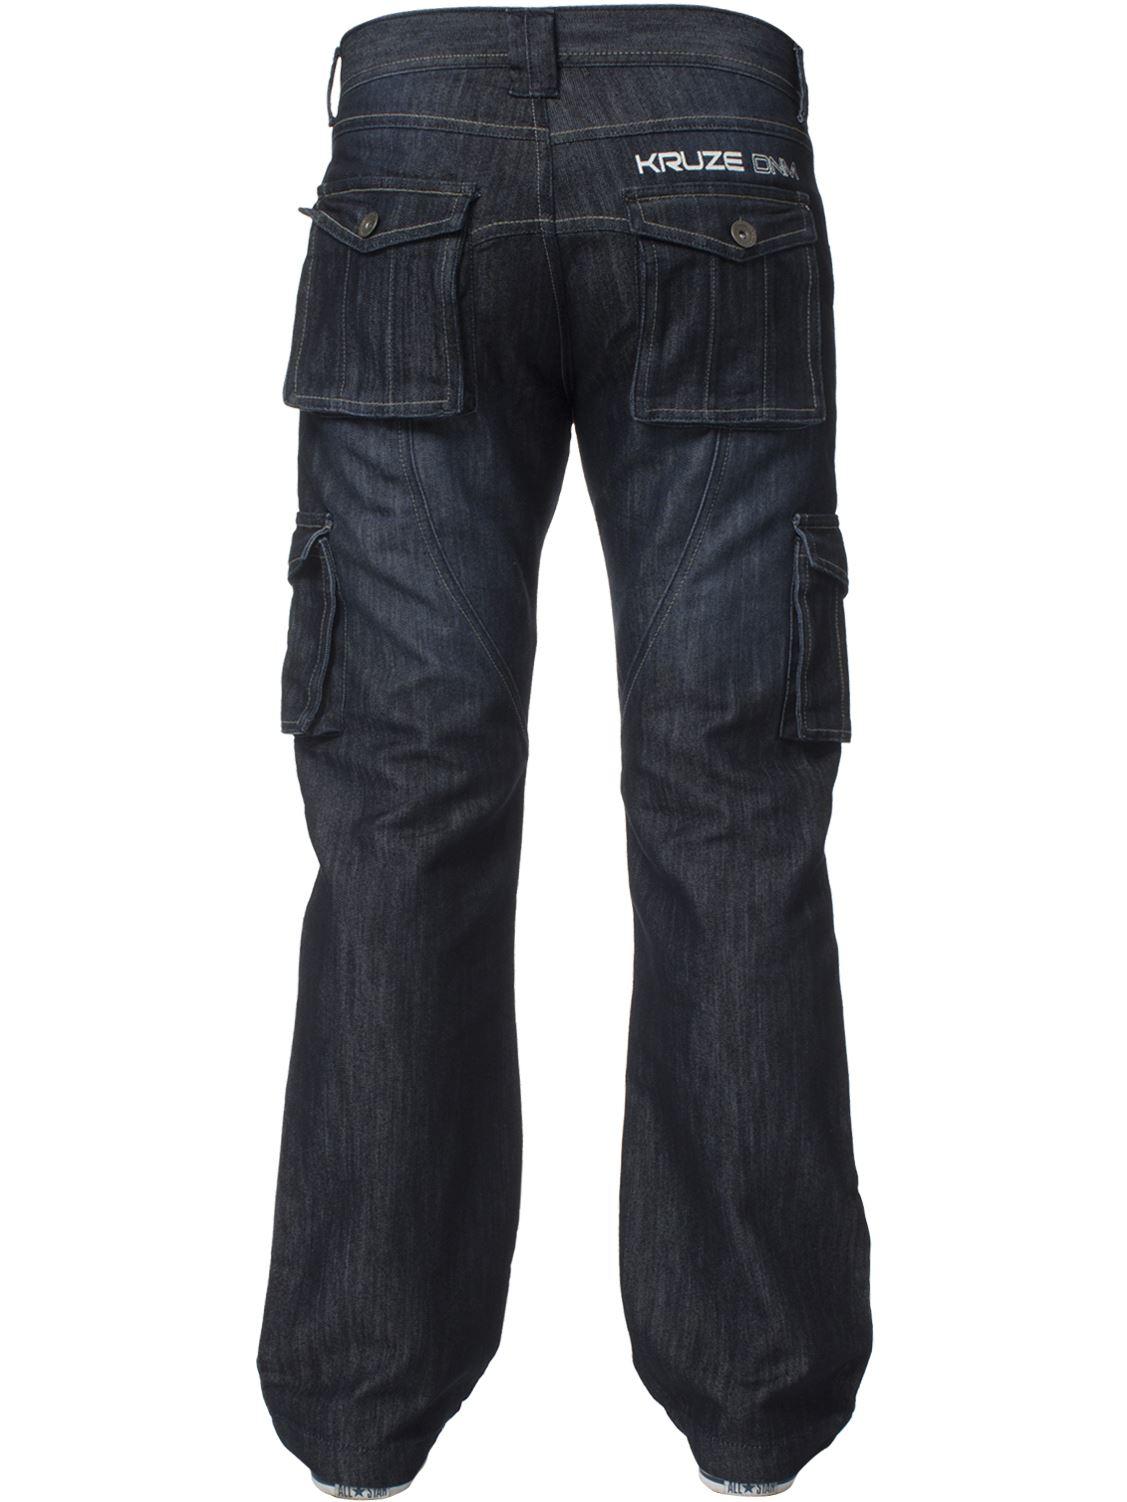 Grandes-jeans-para-hombre-de-combate-de-Kruze-Rey-Alto-Pierna-Cargo-Pantalones-Jeans-Pantalones miniatura 12